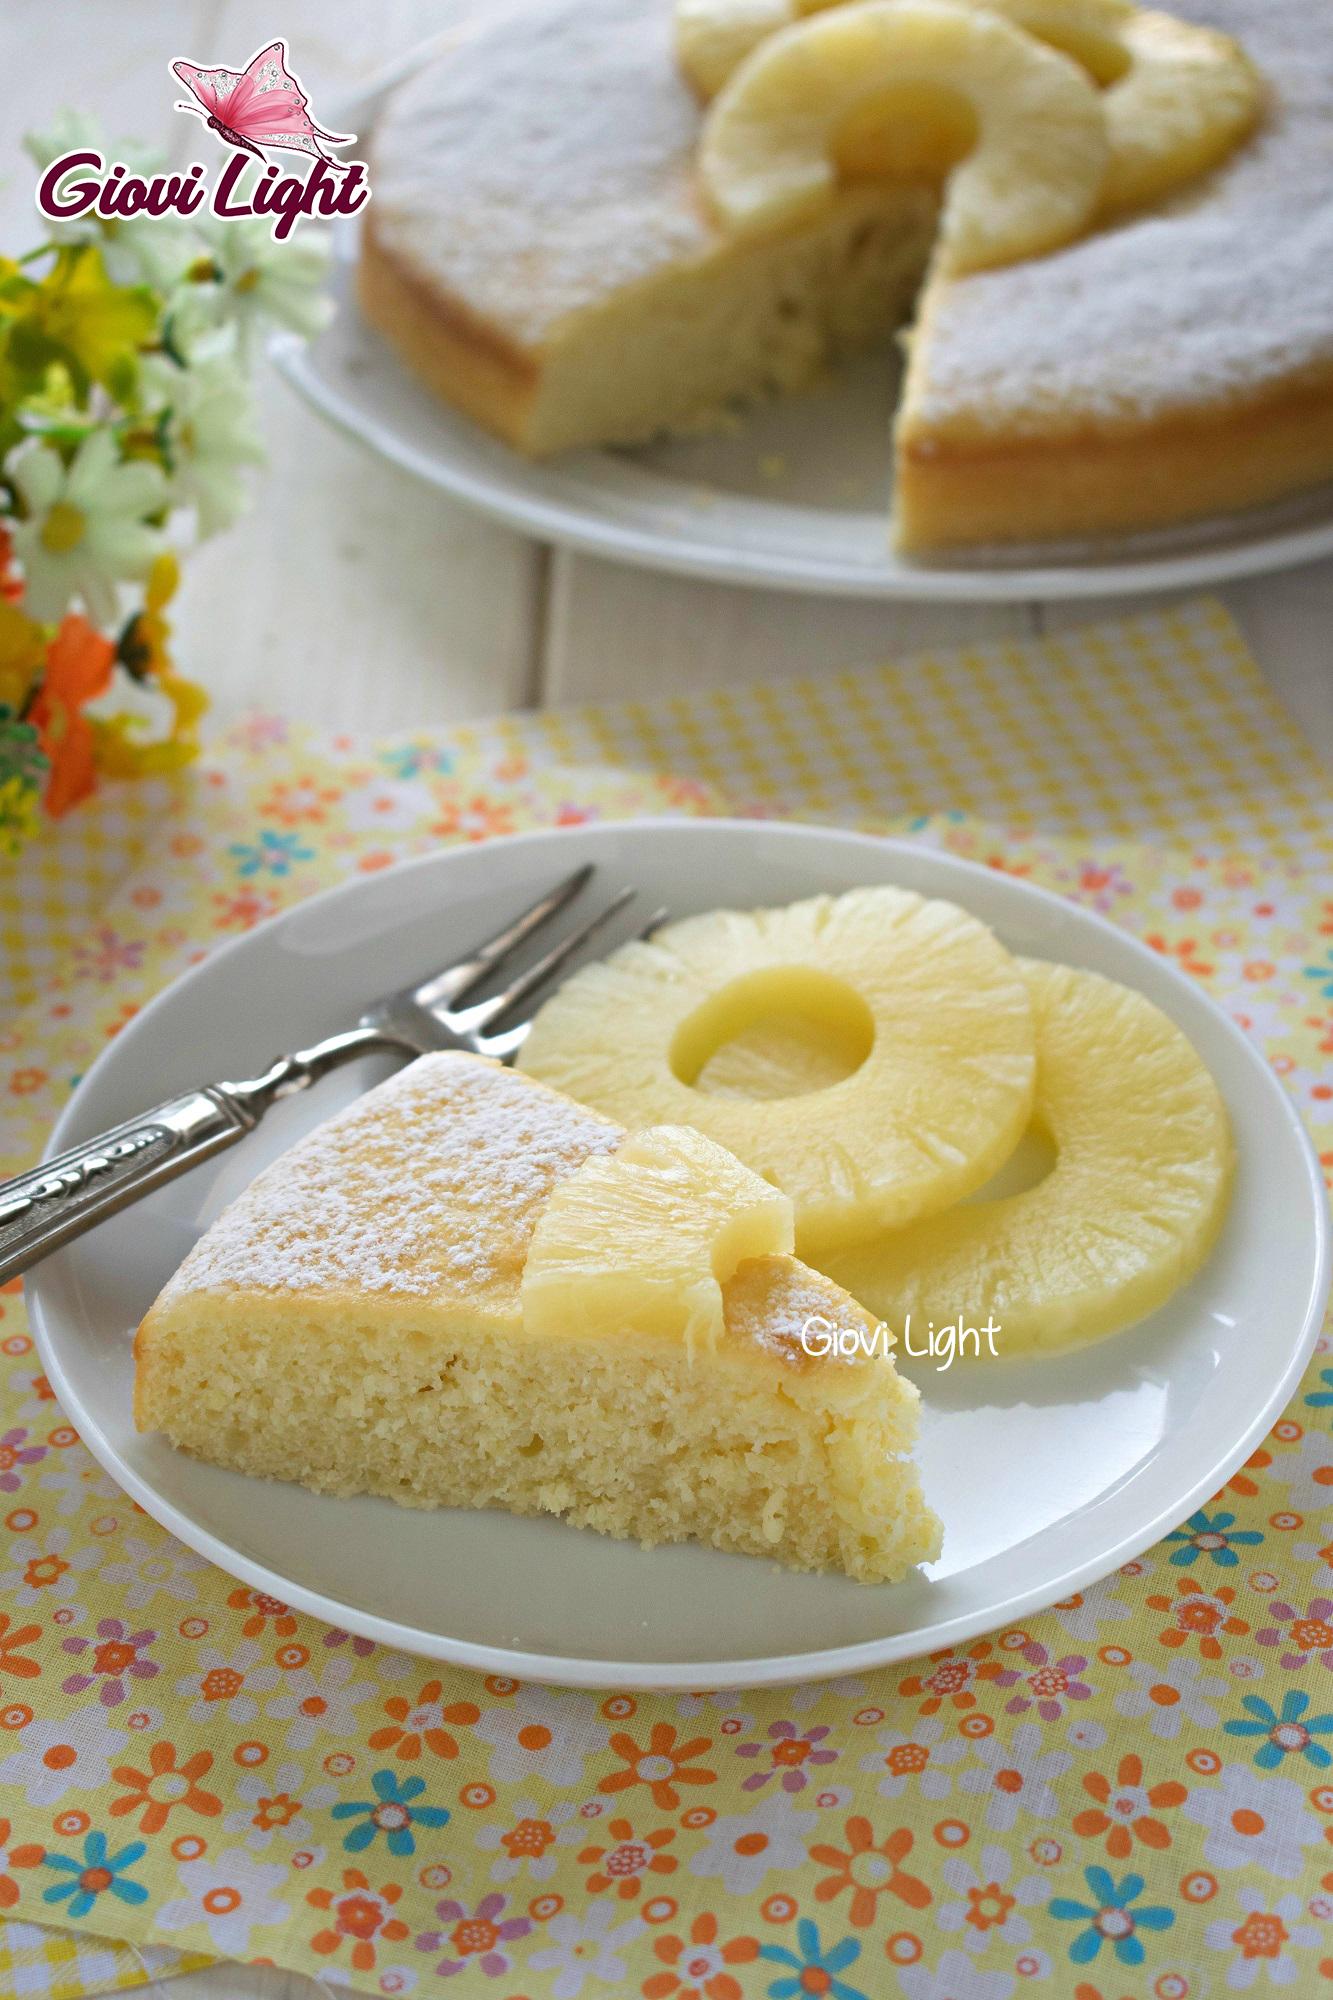 Torta Light Bimby.Torta Light All Ananas Con Il Bimby E Senza